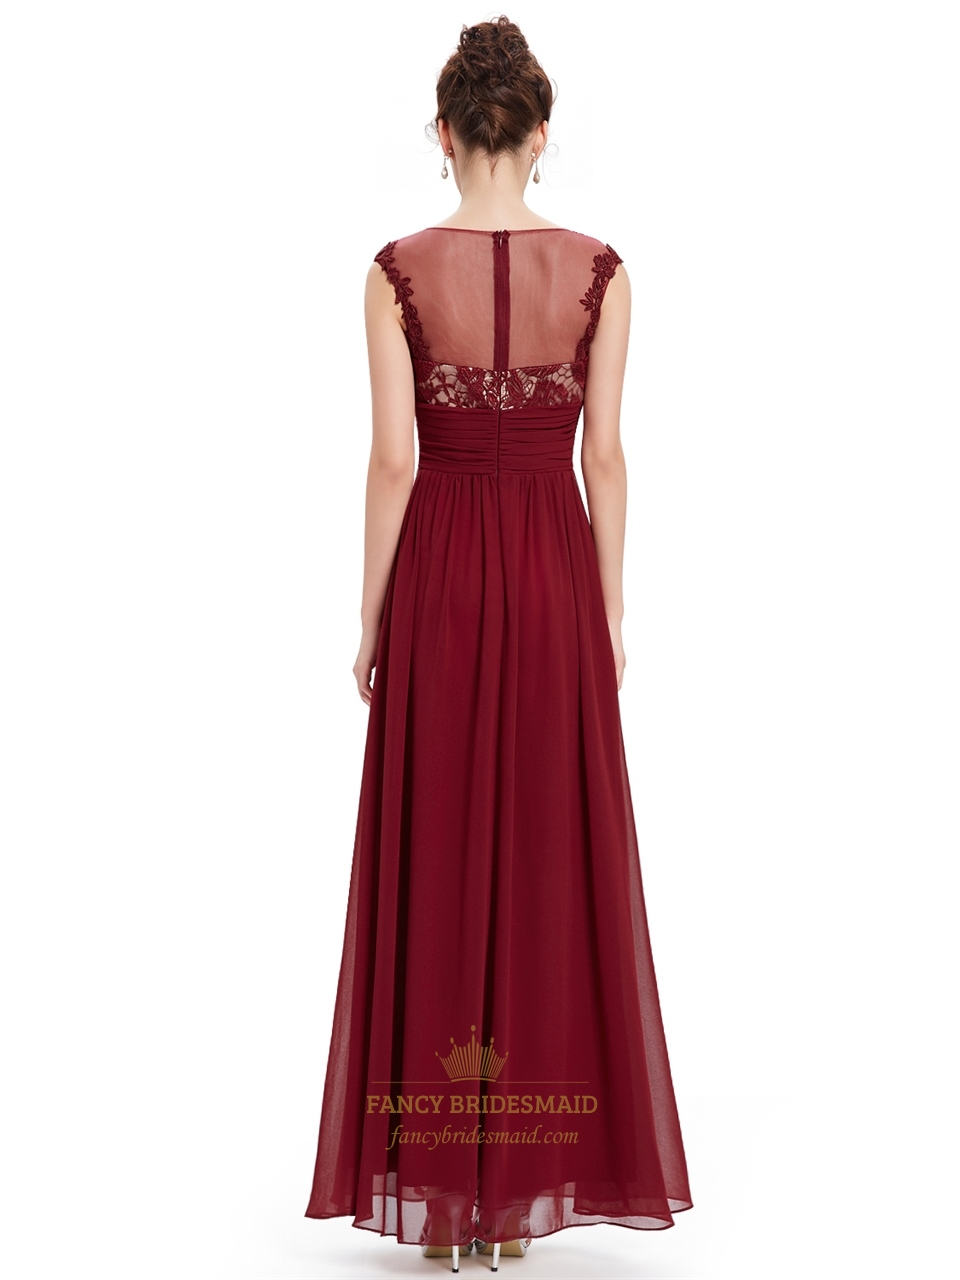 Burgundy Lace Bodice Scoop Neck Chiffon Prom Dress With